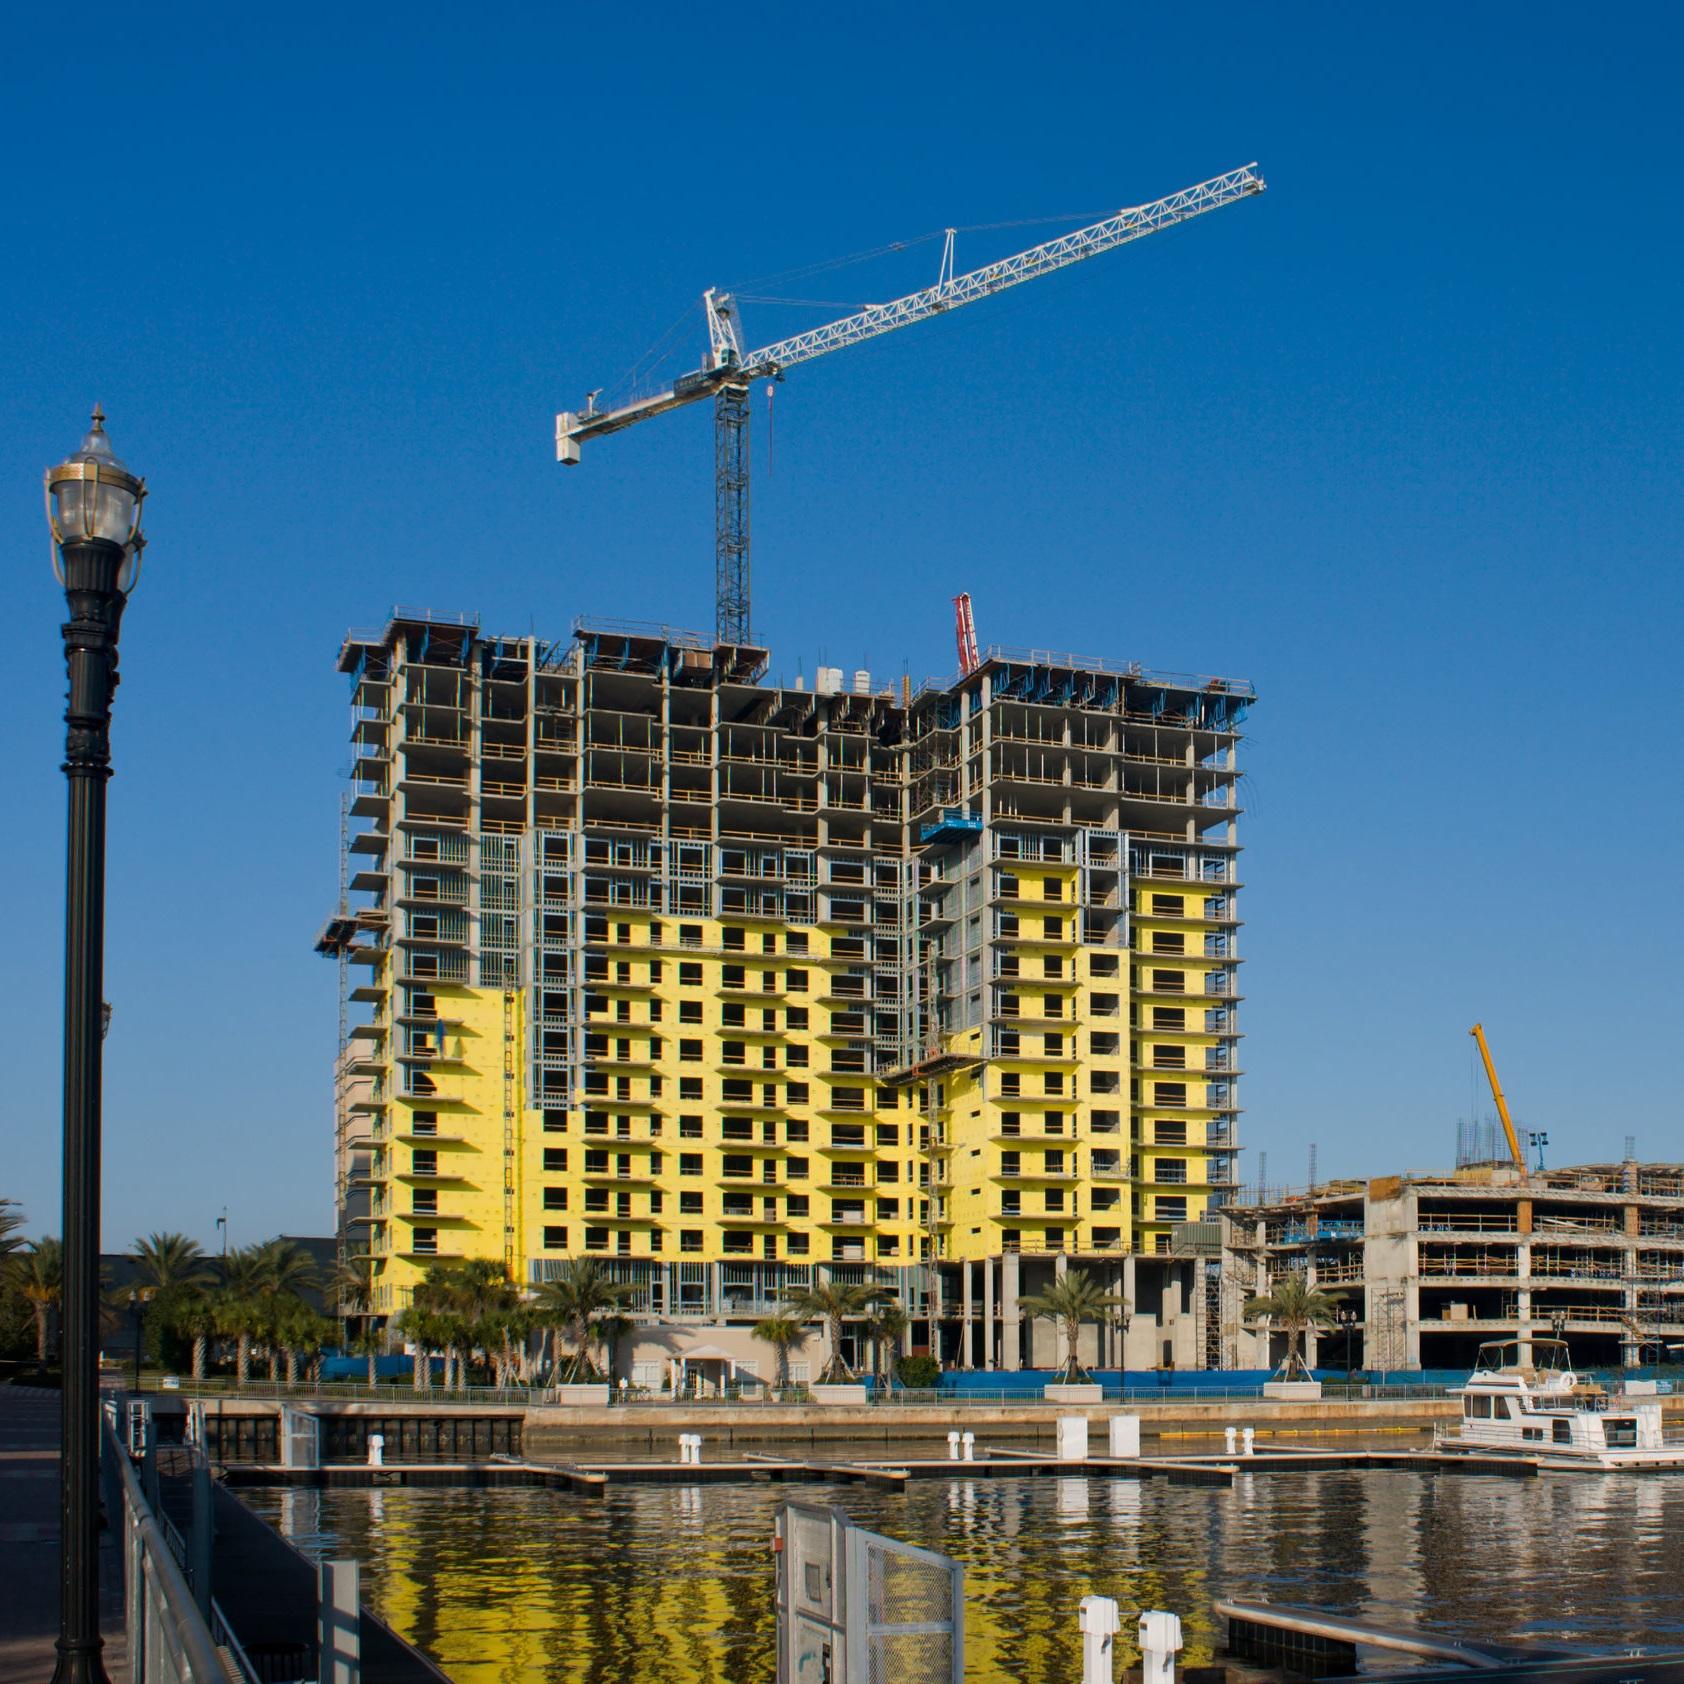 resort_developer_condo_insurance_marine_insurance_house.jpg